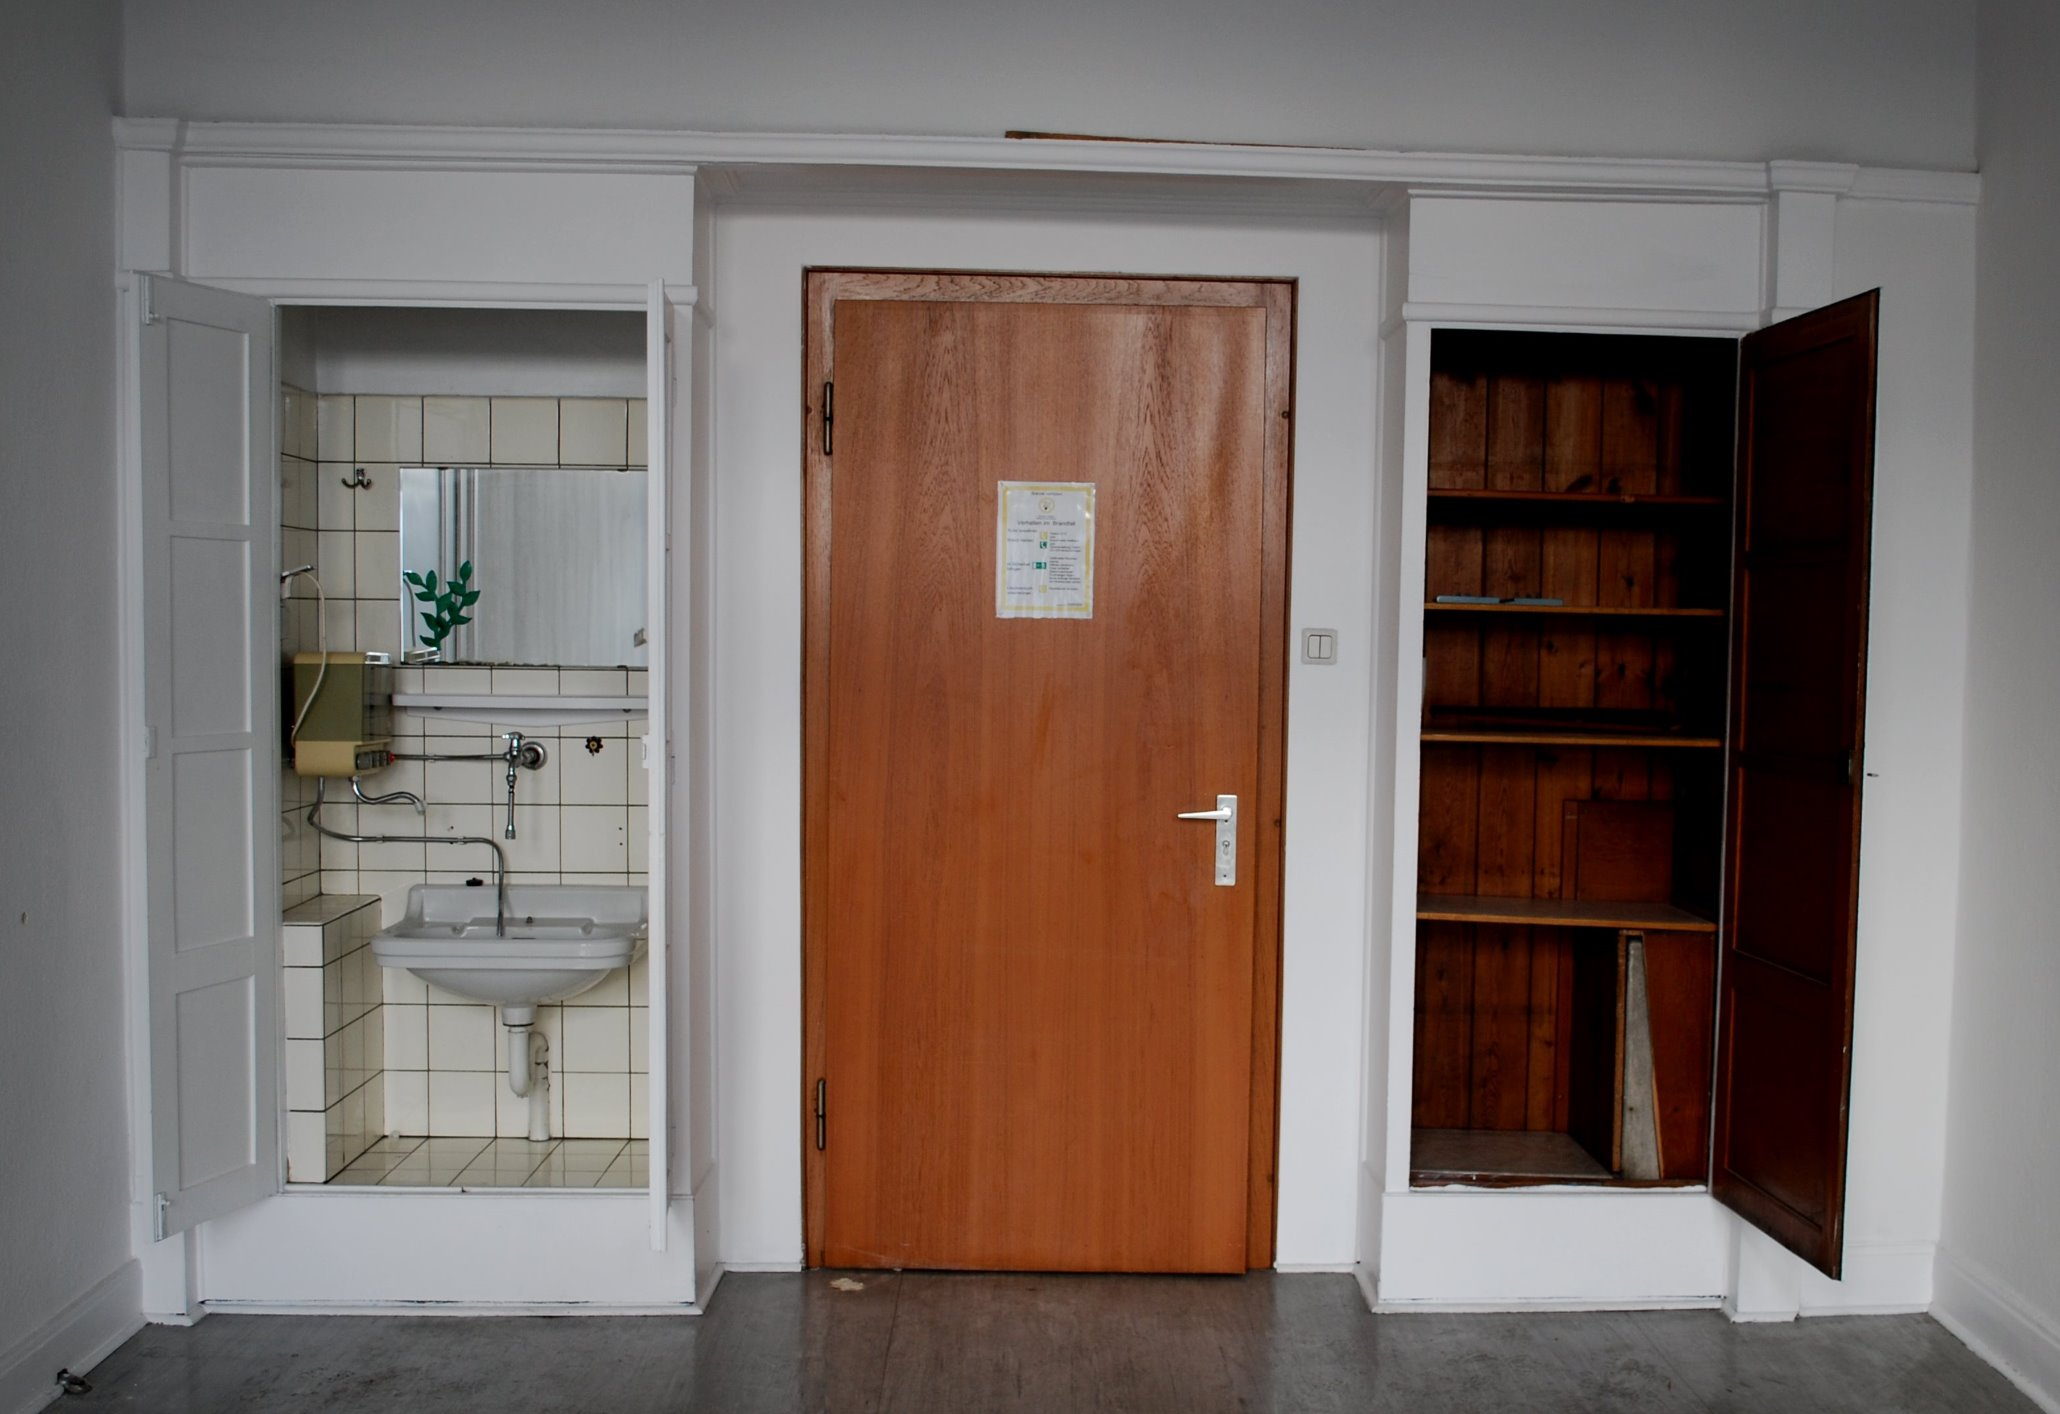 Hoesch Zentrale Konservierung Denkmalgeschutzter Einbauschranke